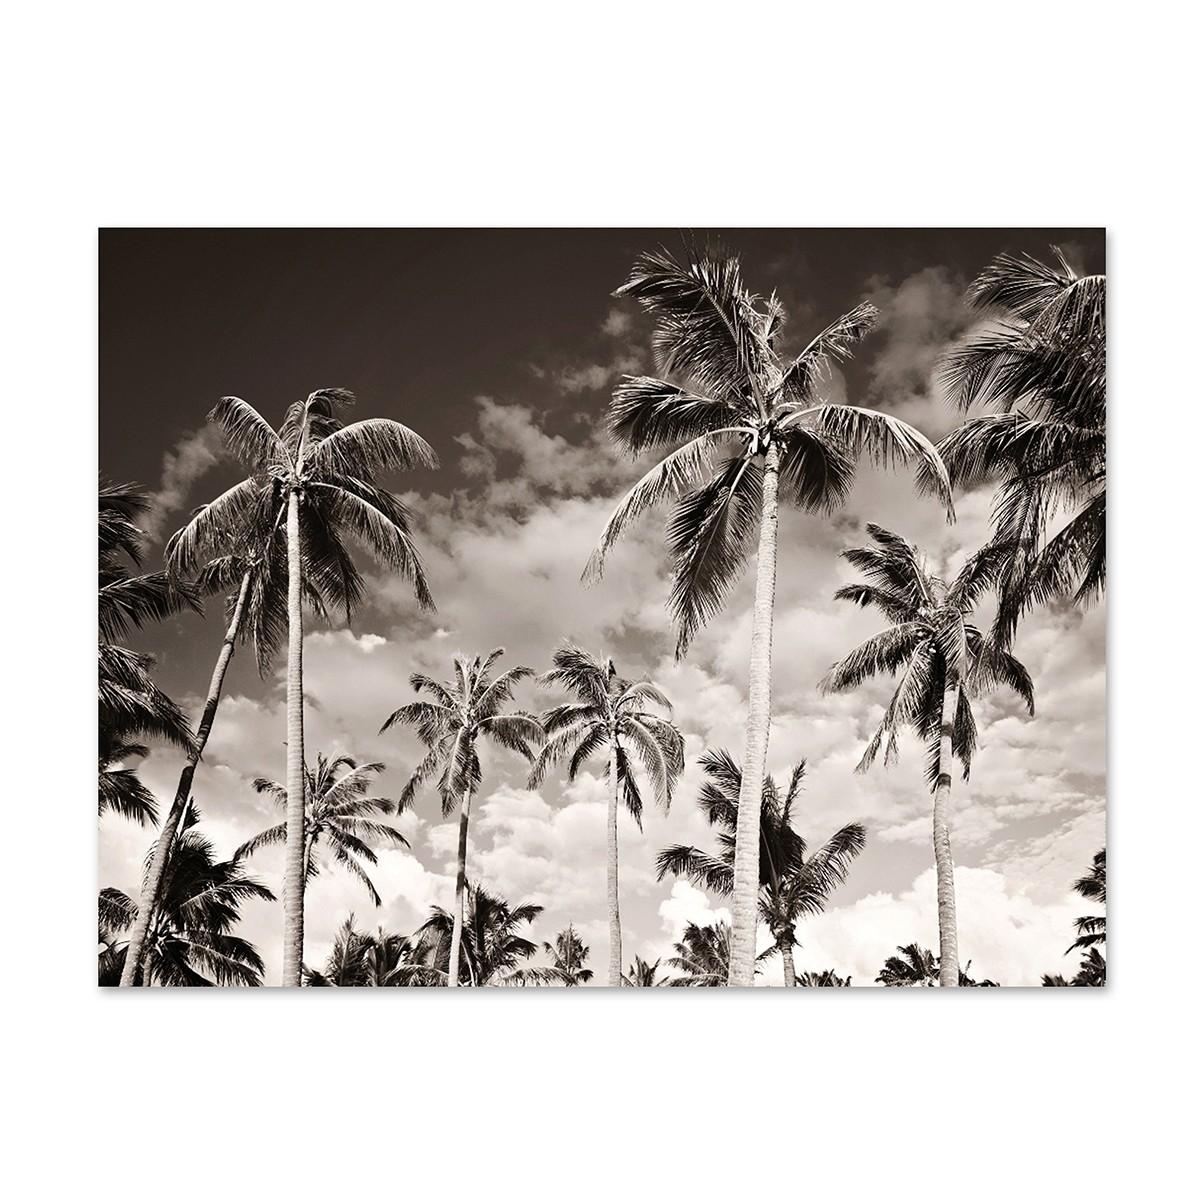 poster 39 palmen unter kalifornischem himmel 39 30x40 cm schwarz weiss motiv natur landschaft poster. Black Bedroom Furniture Sets. Home Design Ideas